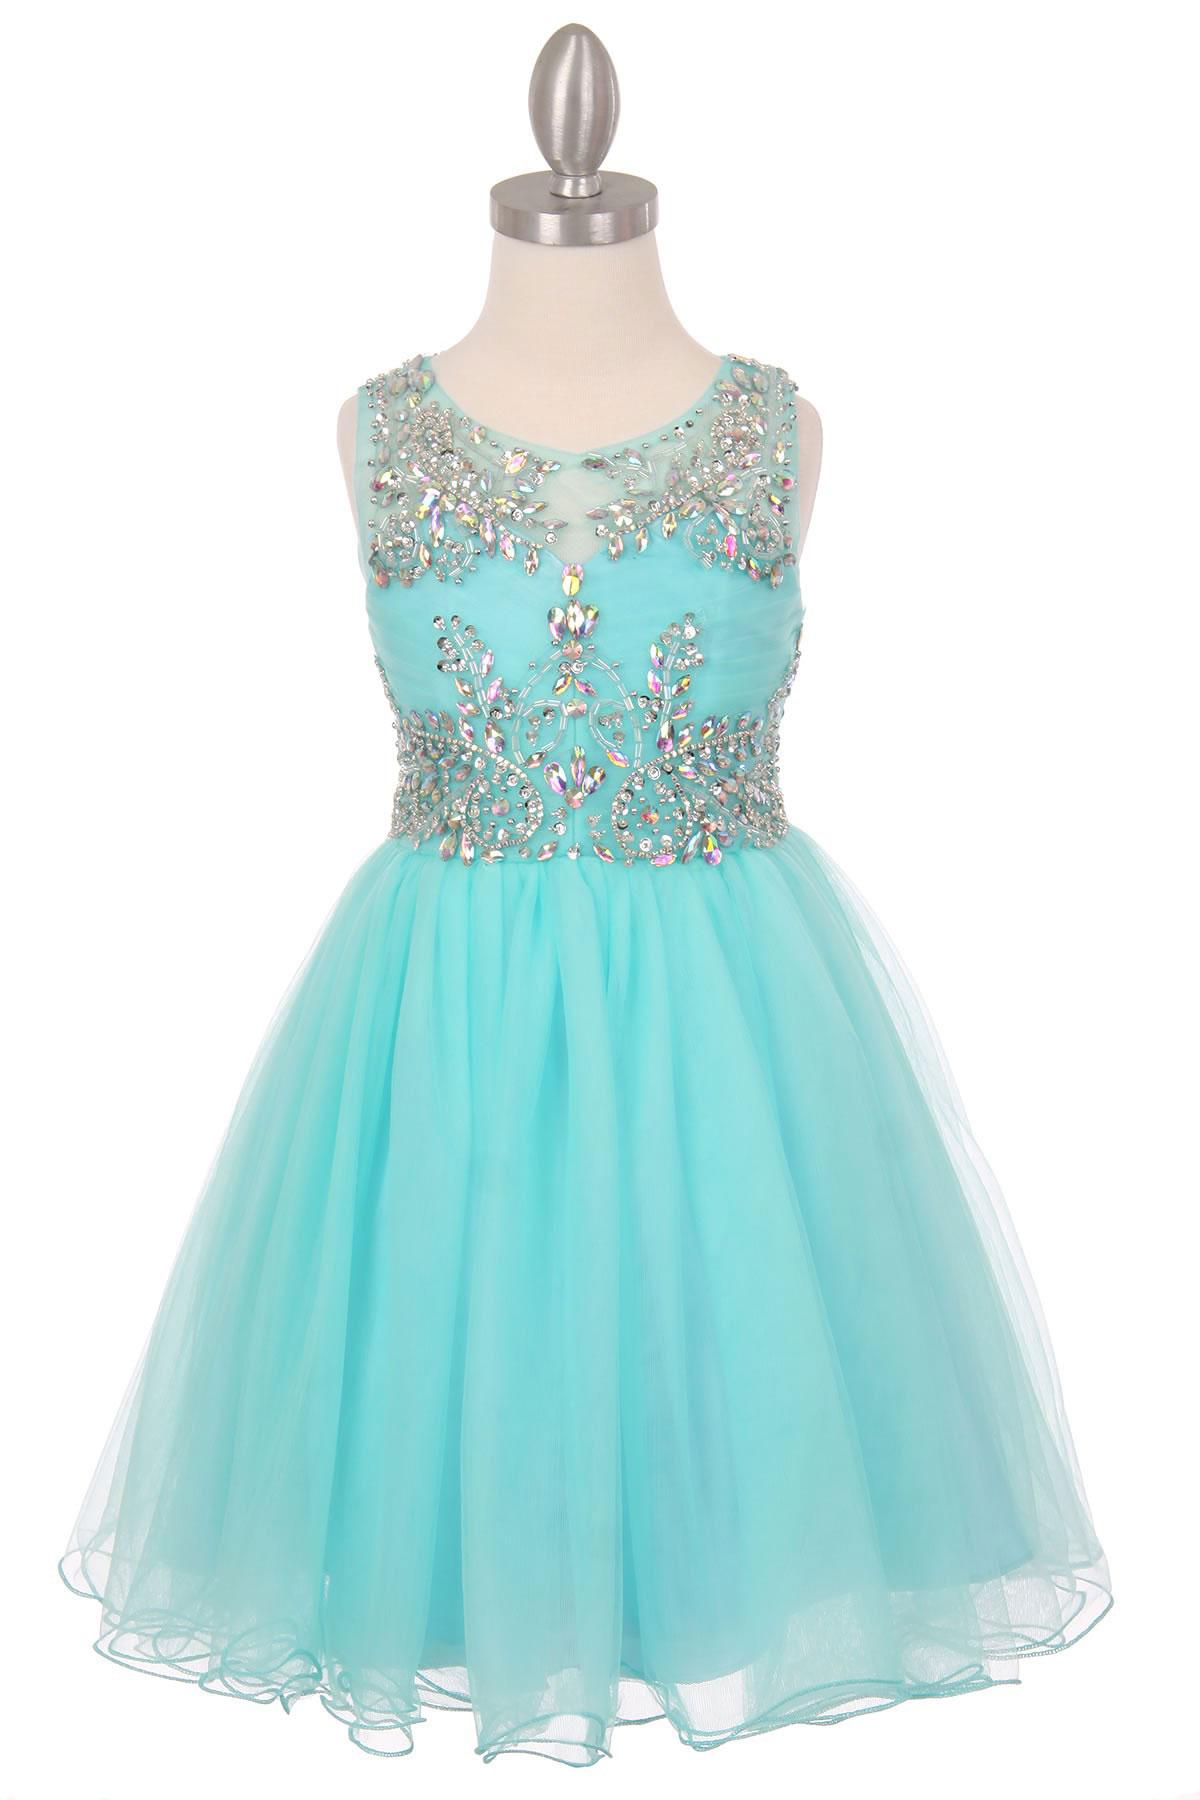 Cc 65007aq Girls Dress Style 65007 Aqua Sleeveless